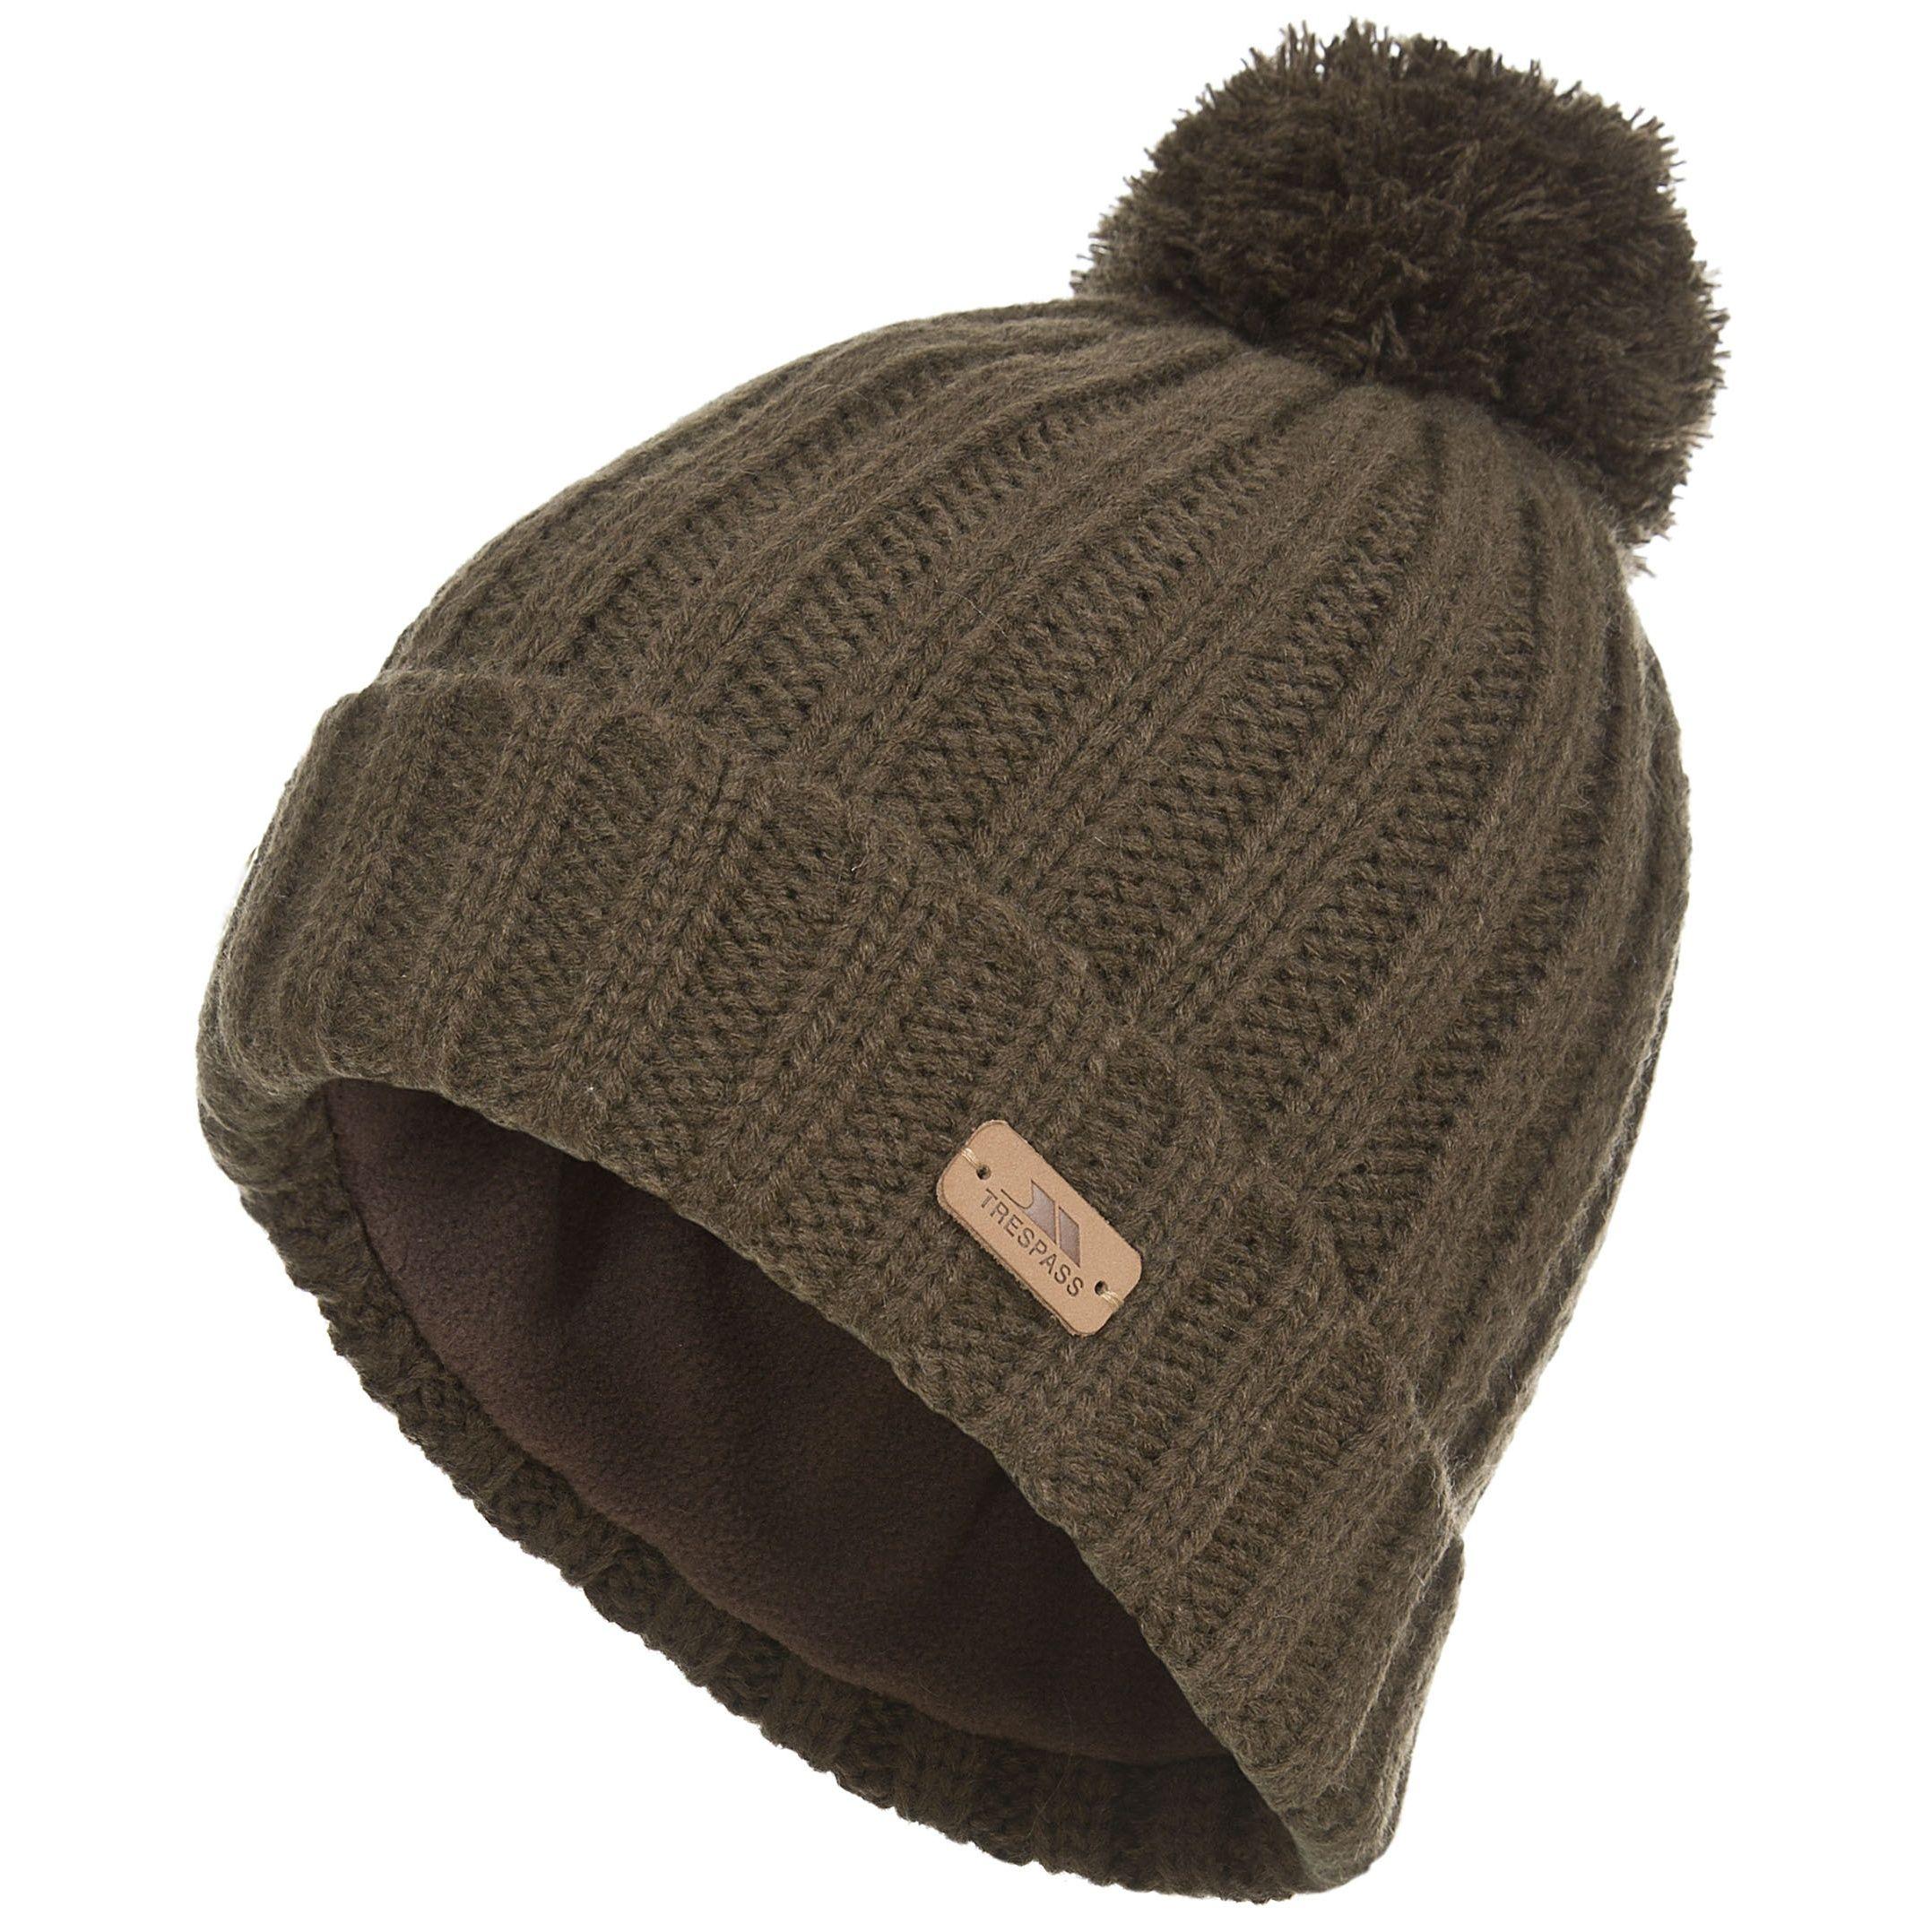 Trespass Mens Thorns Beanie Hat